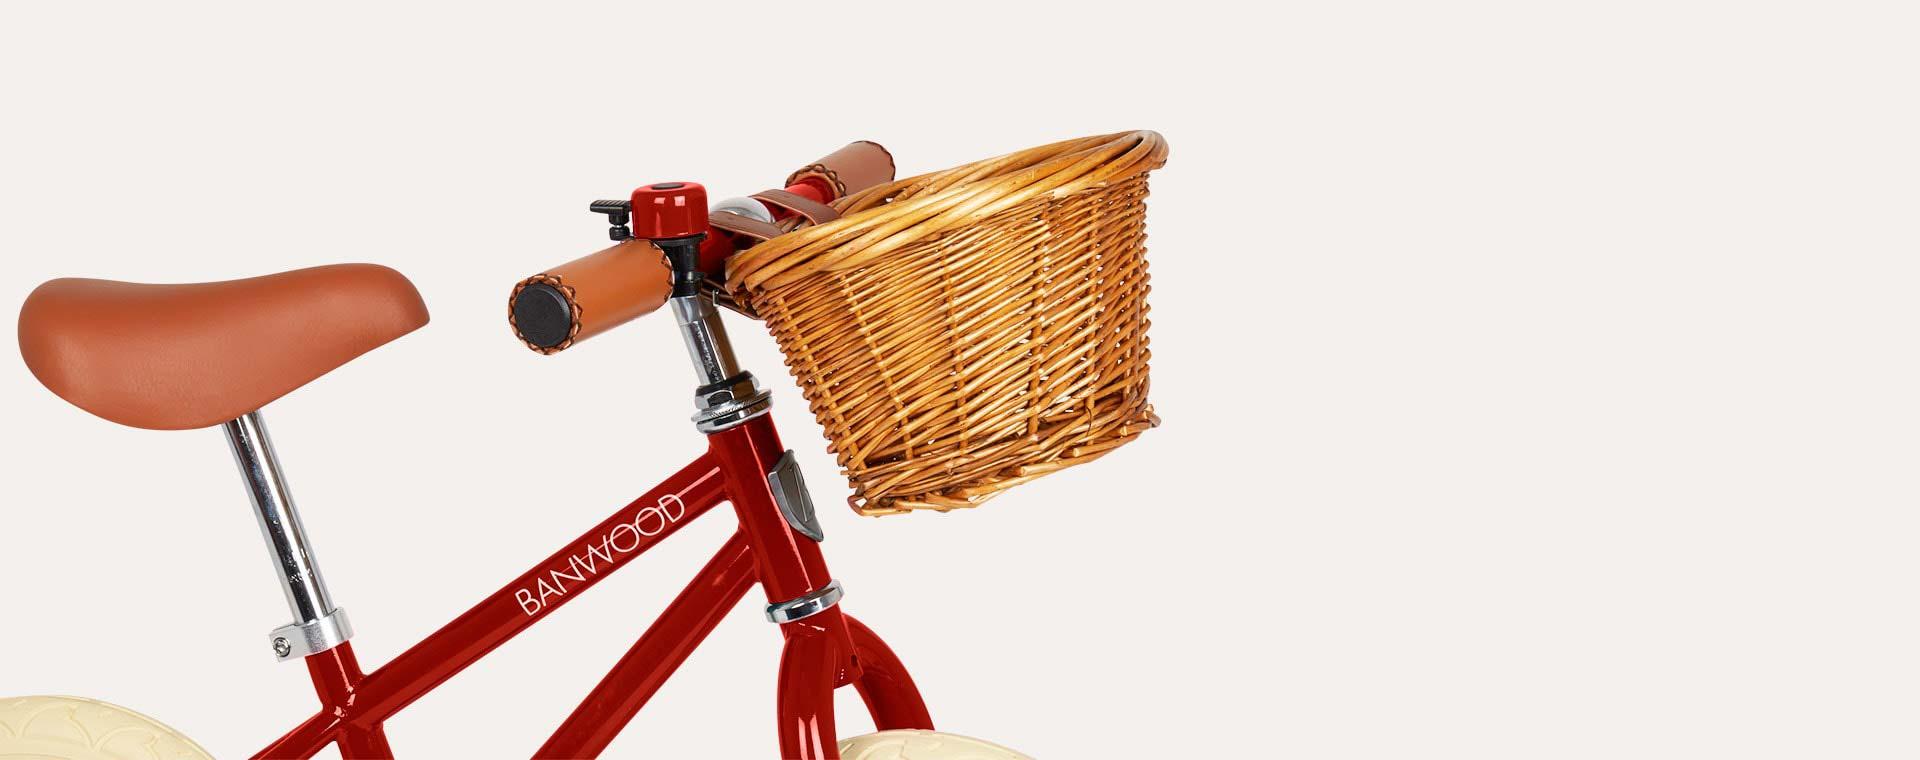 Red Banwood First Go Balance Bike